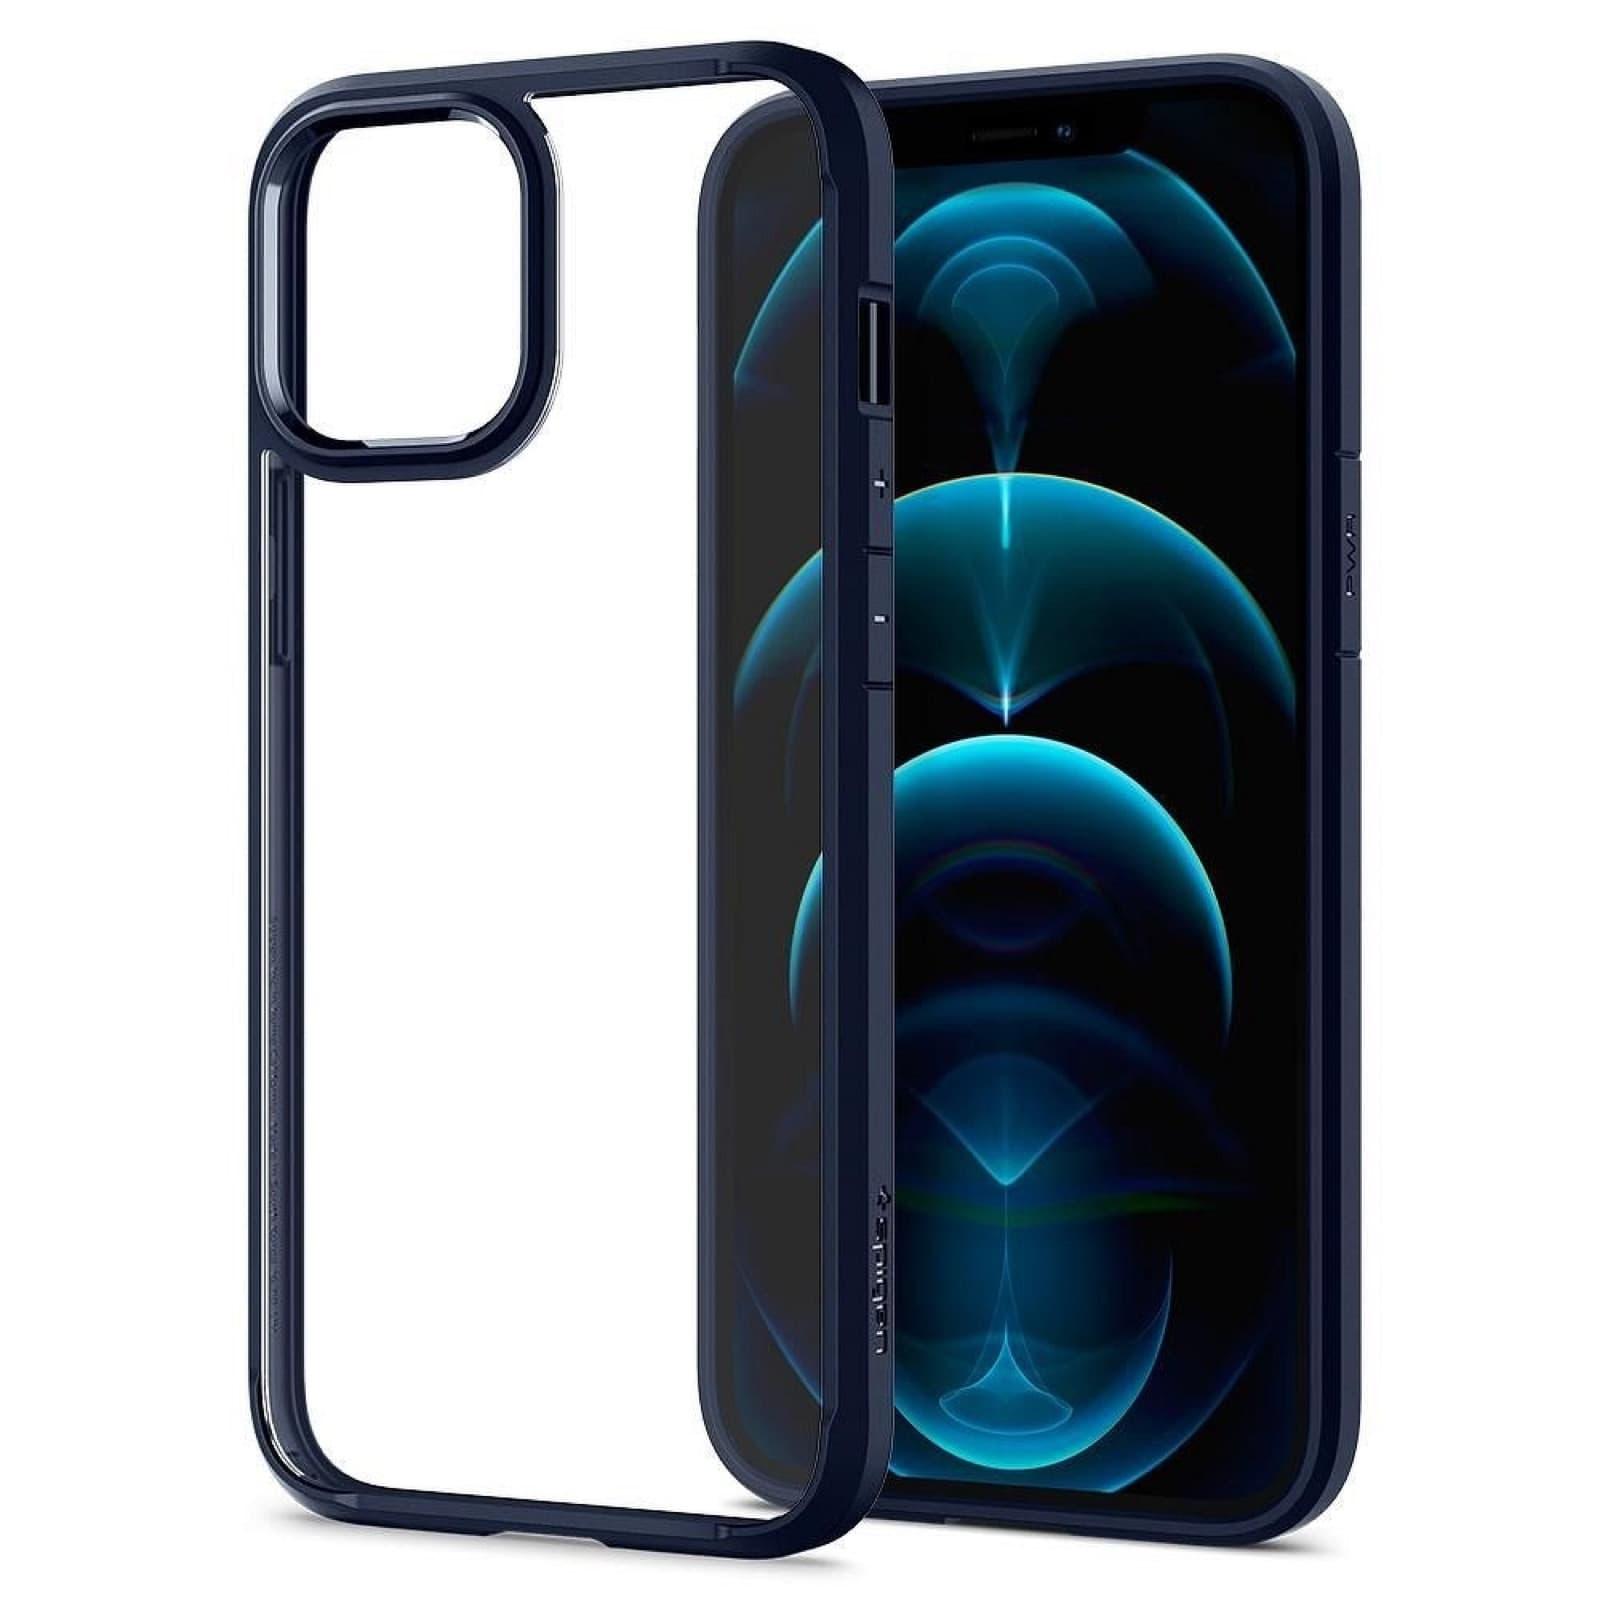 Coque Spigen® Ultra Hybrid Pour iPhone 12 PRO MAX Bleu Marine